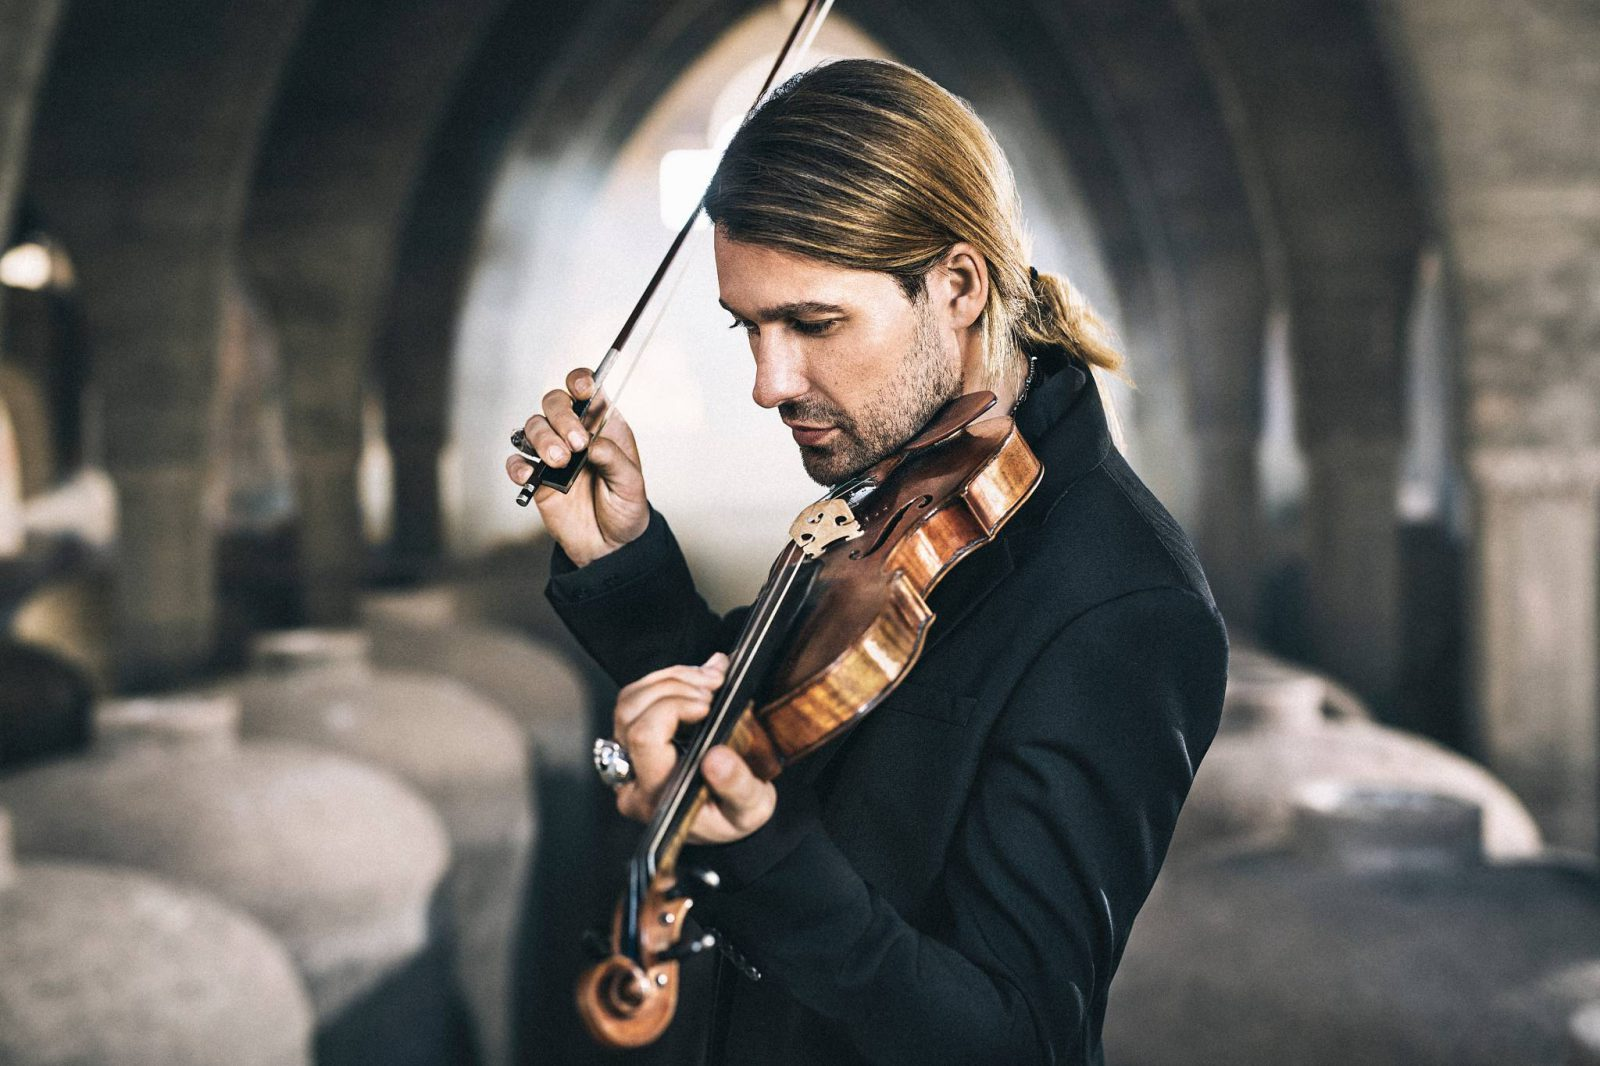 David Garrett (Fot. materiały prasowe/Christoph Köstlin)